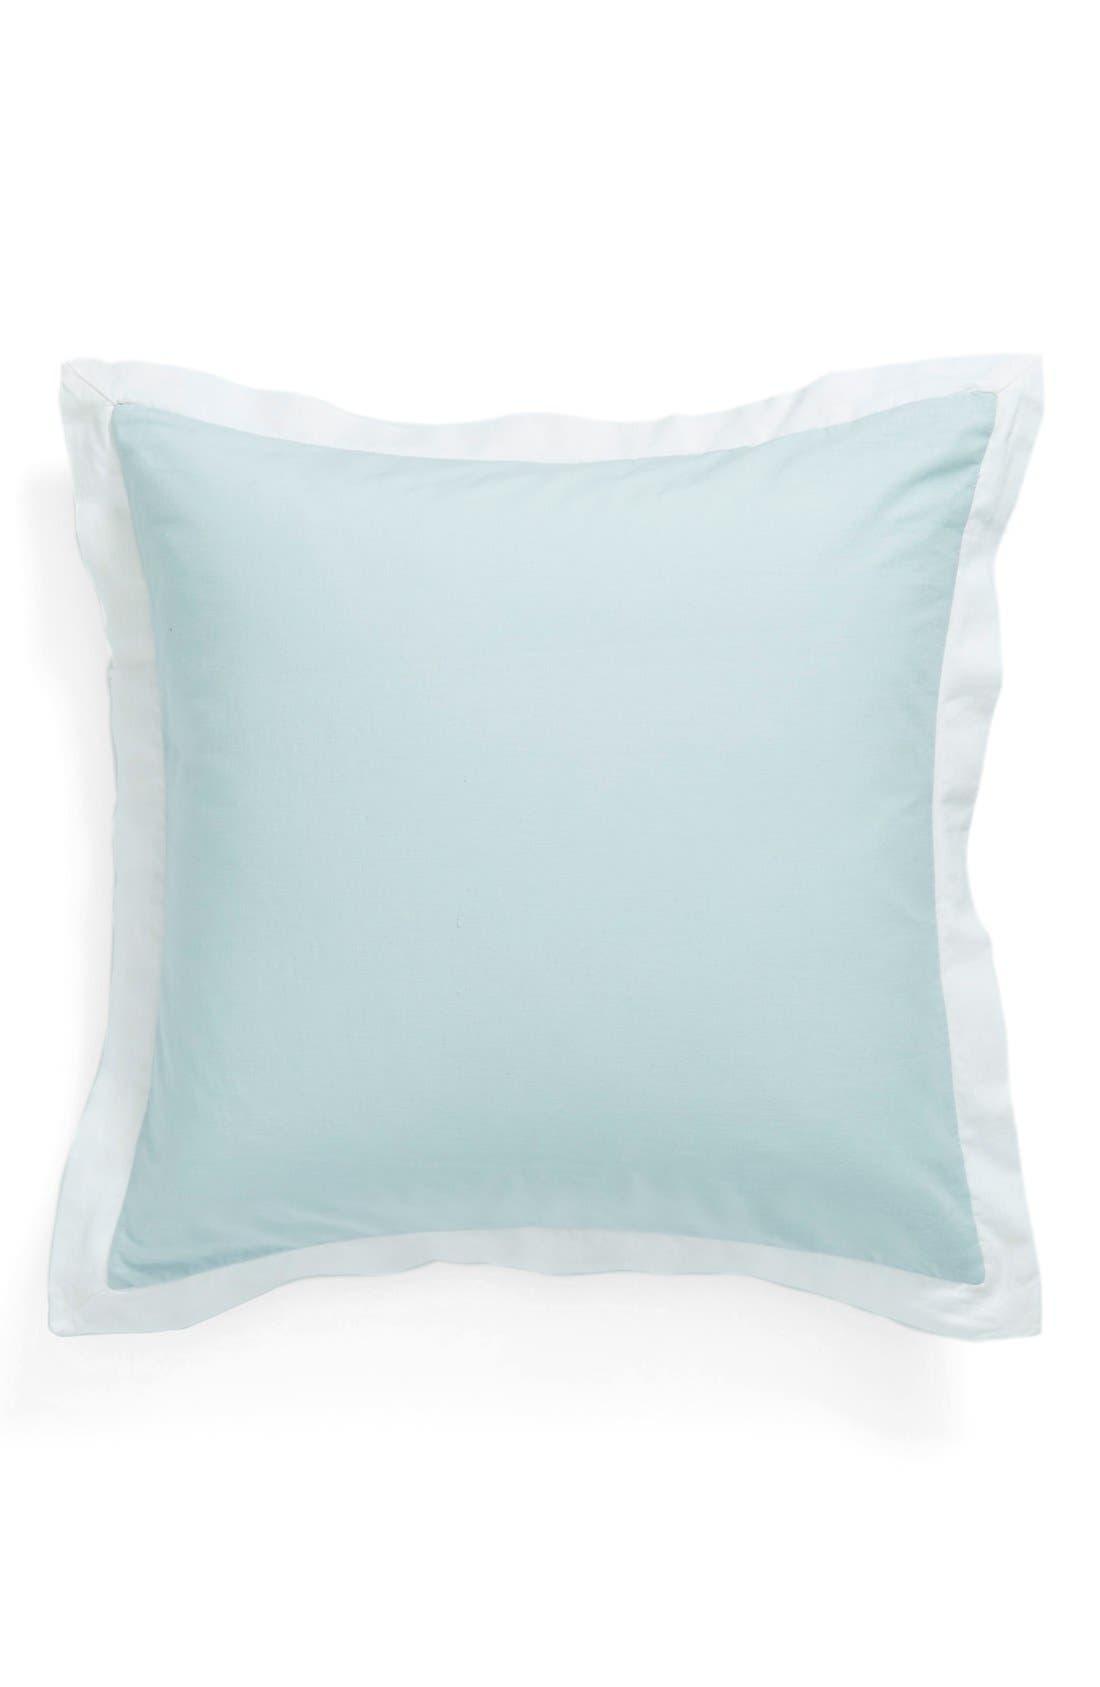 'Spa' Washed Linen Euro Sham,                         Main,                         color, Blue